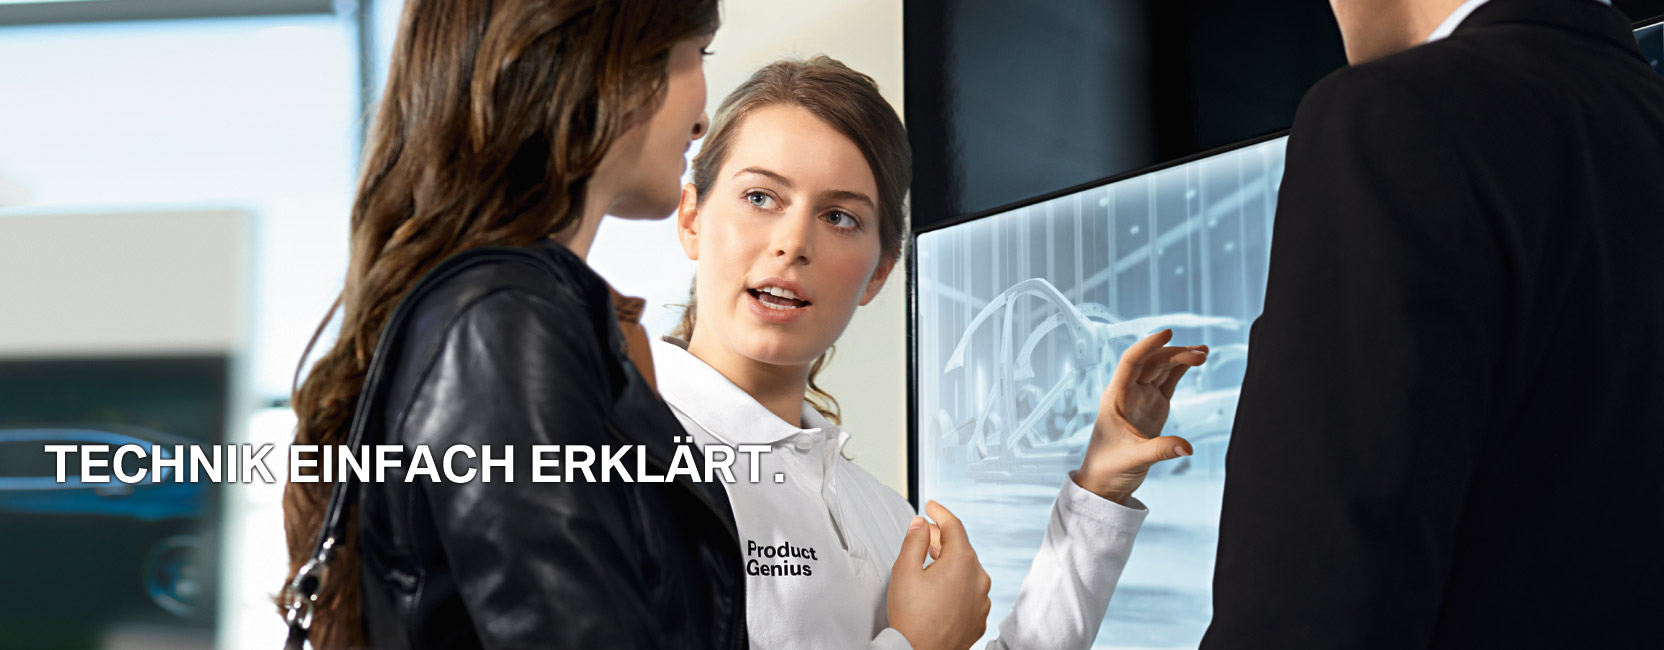 Product Genius bei BMW